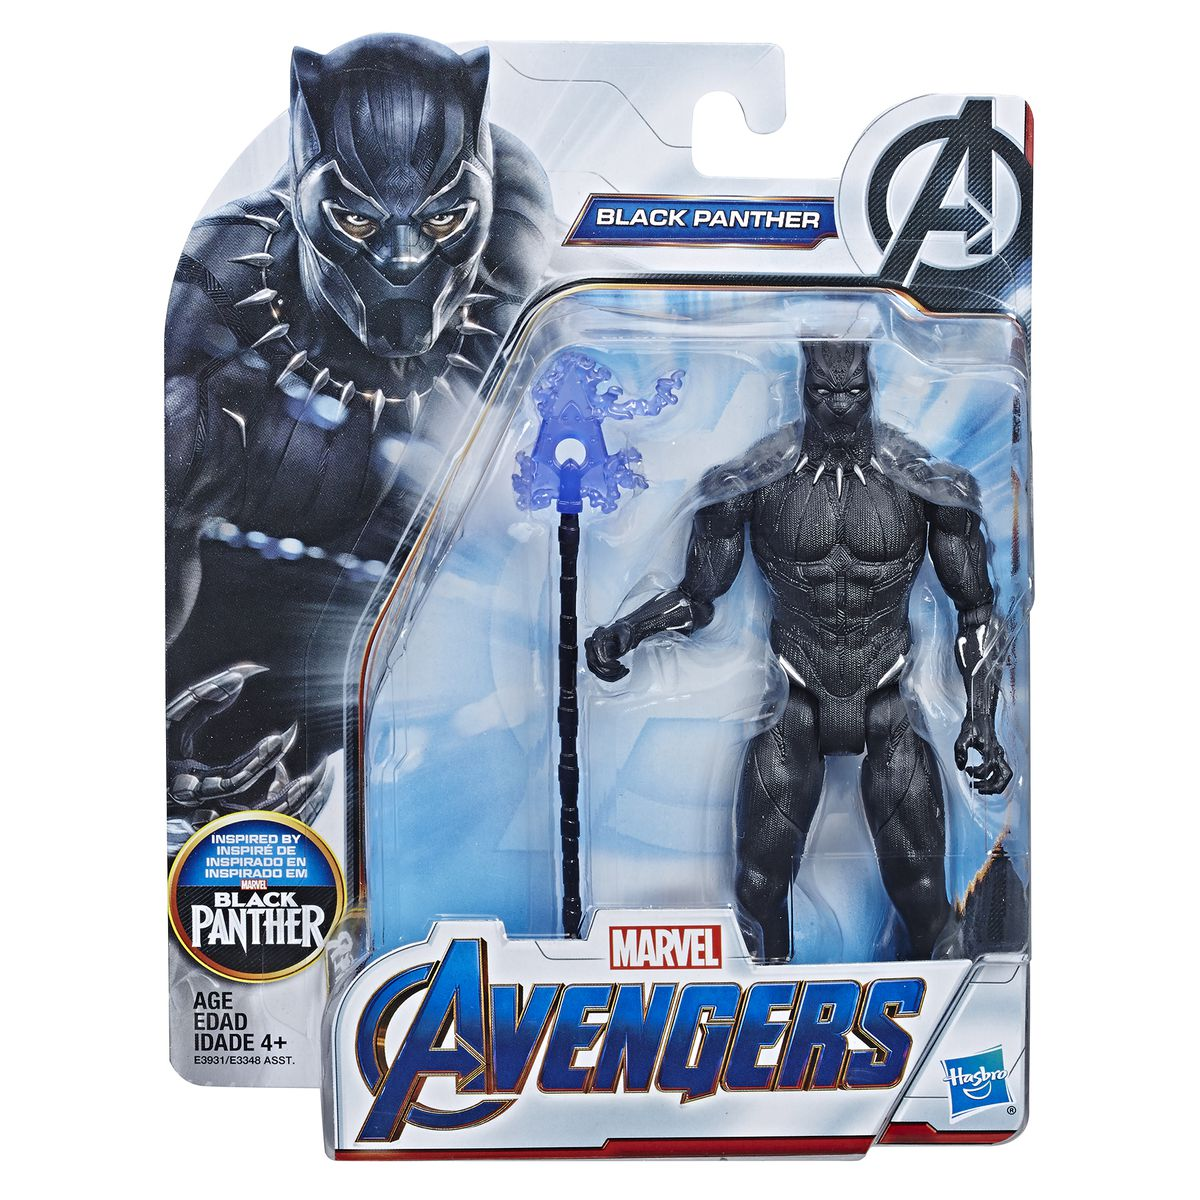 black panther avengers: endgame action figure